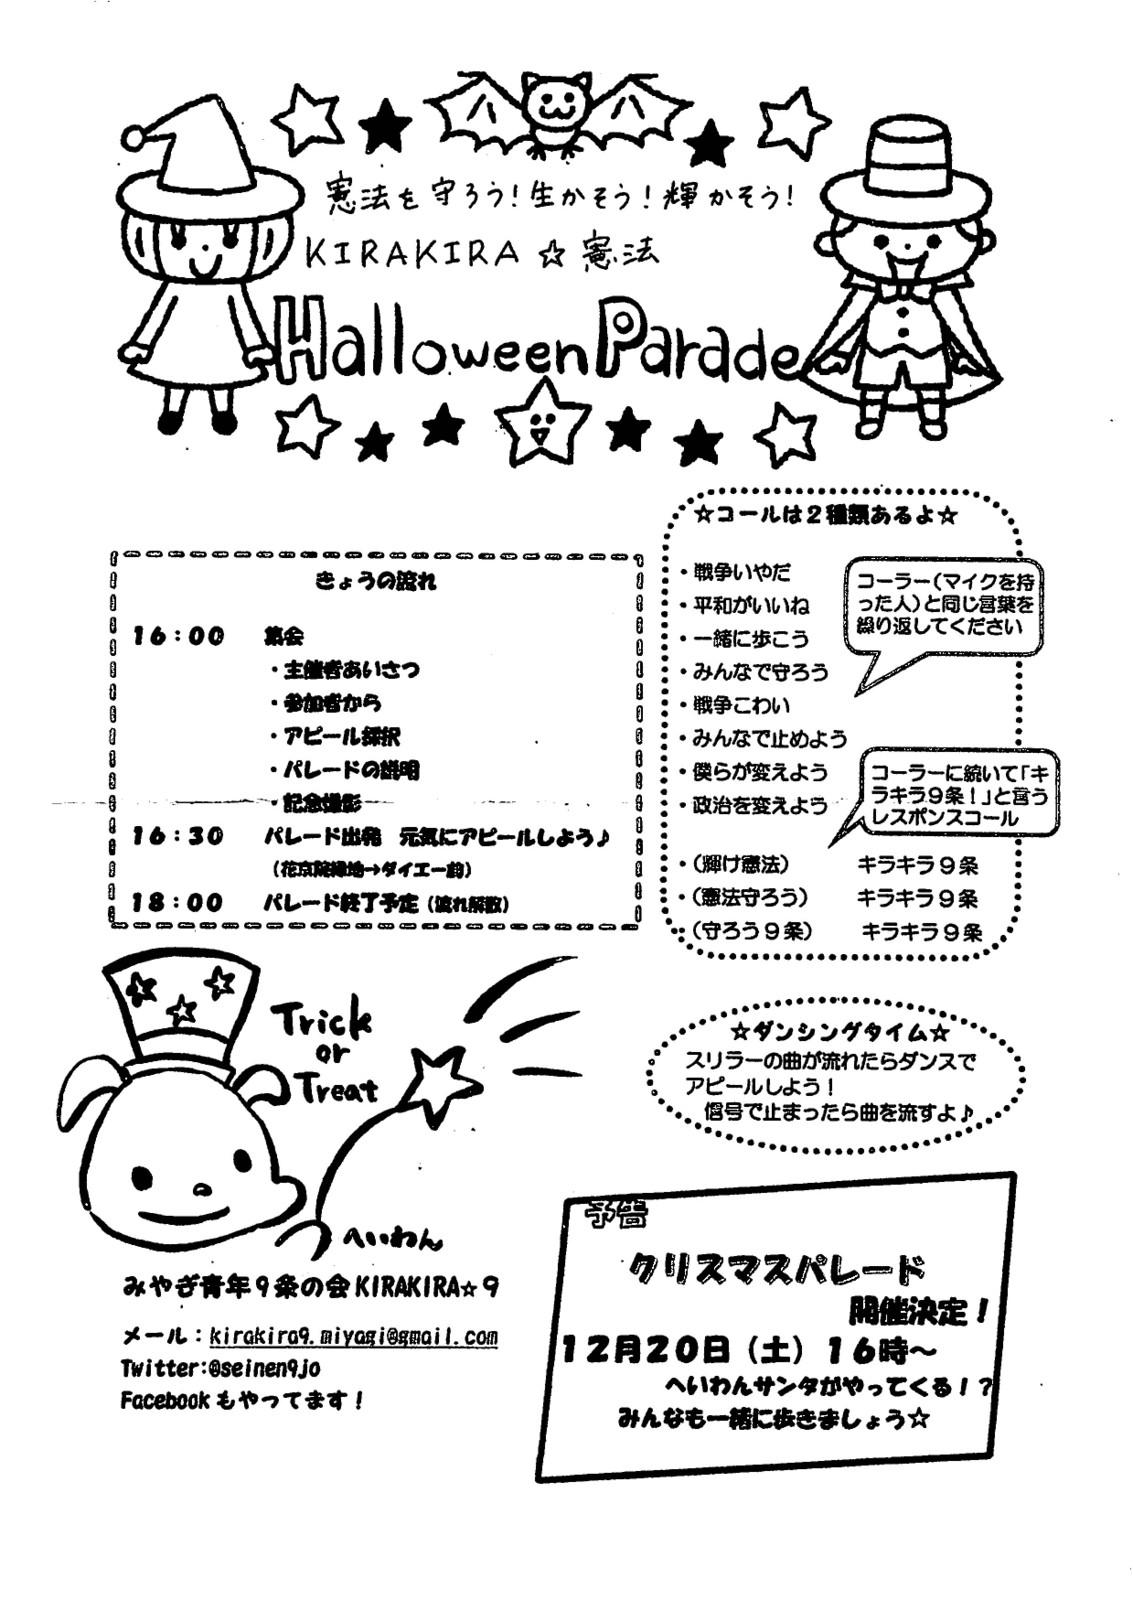 Halloweenparade_1